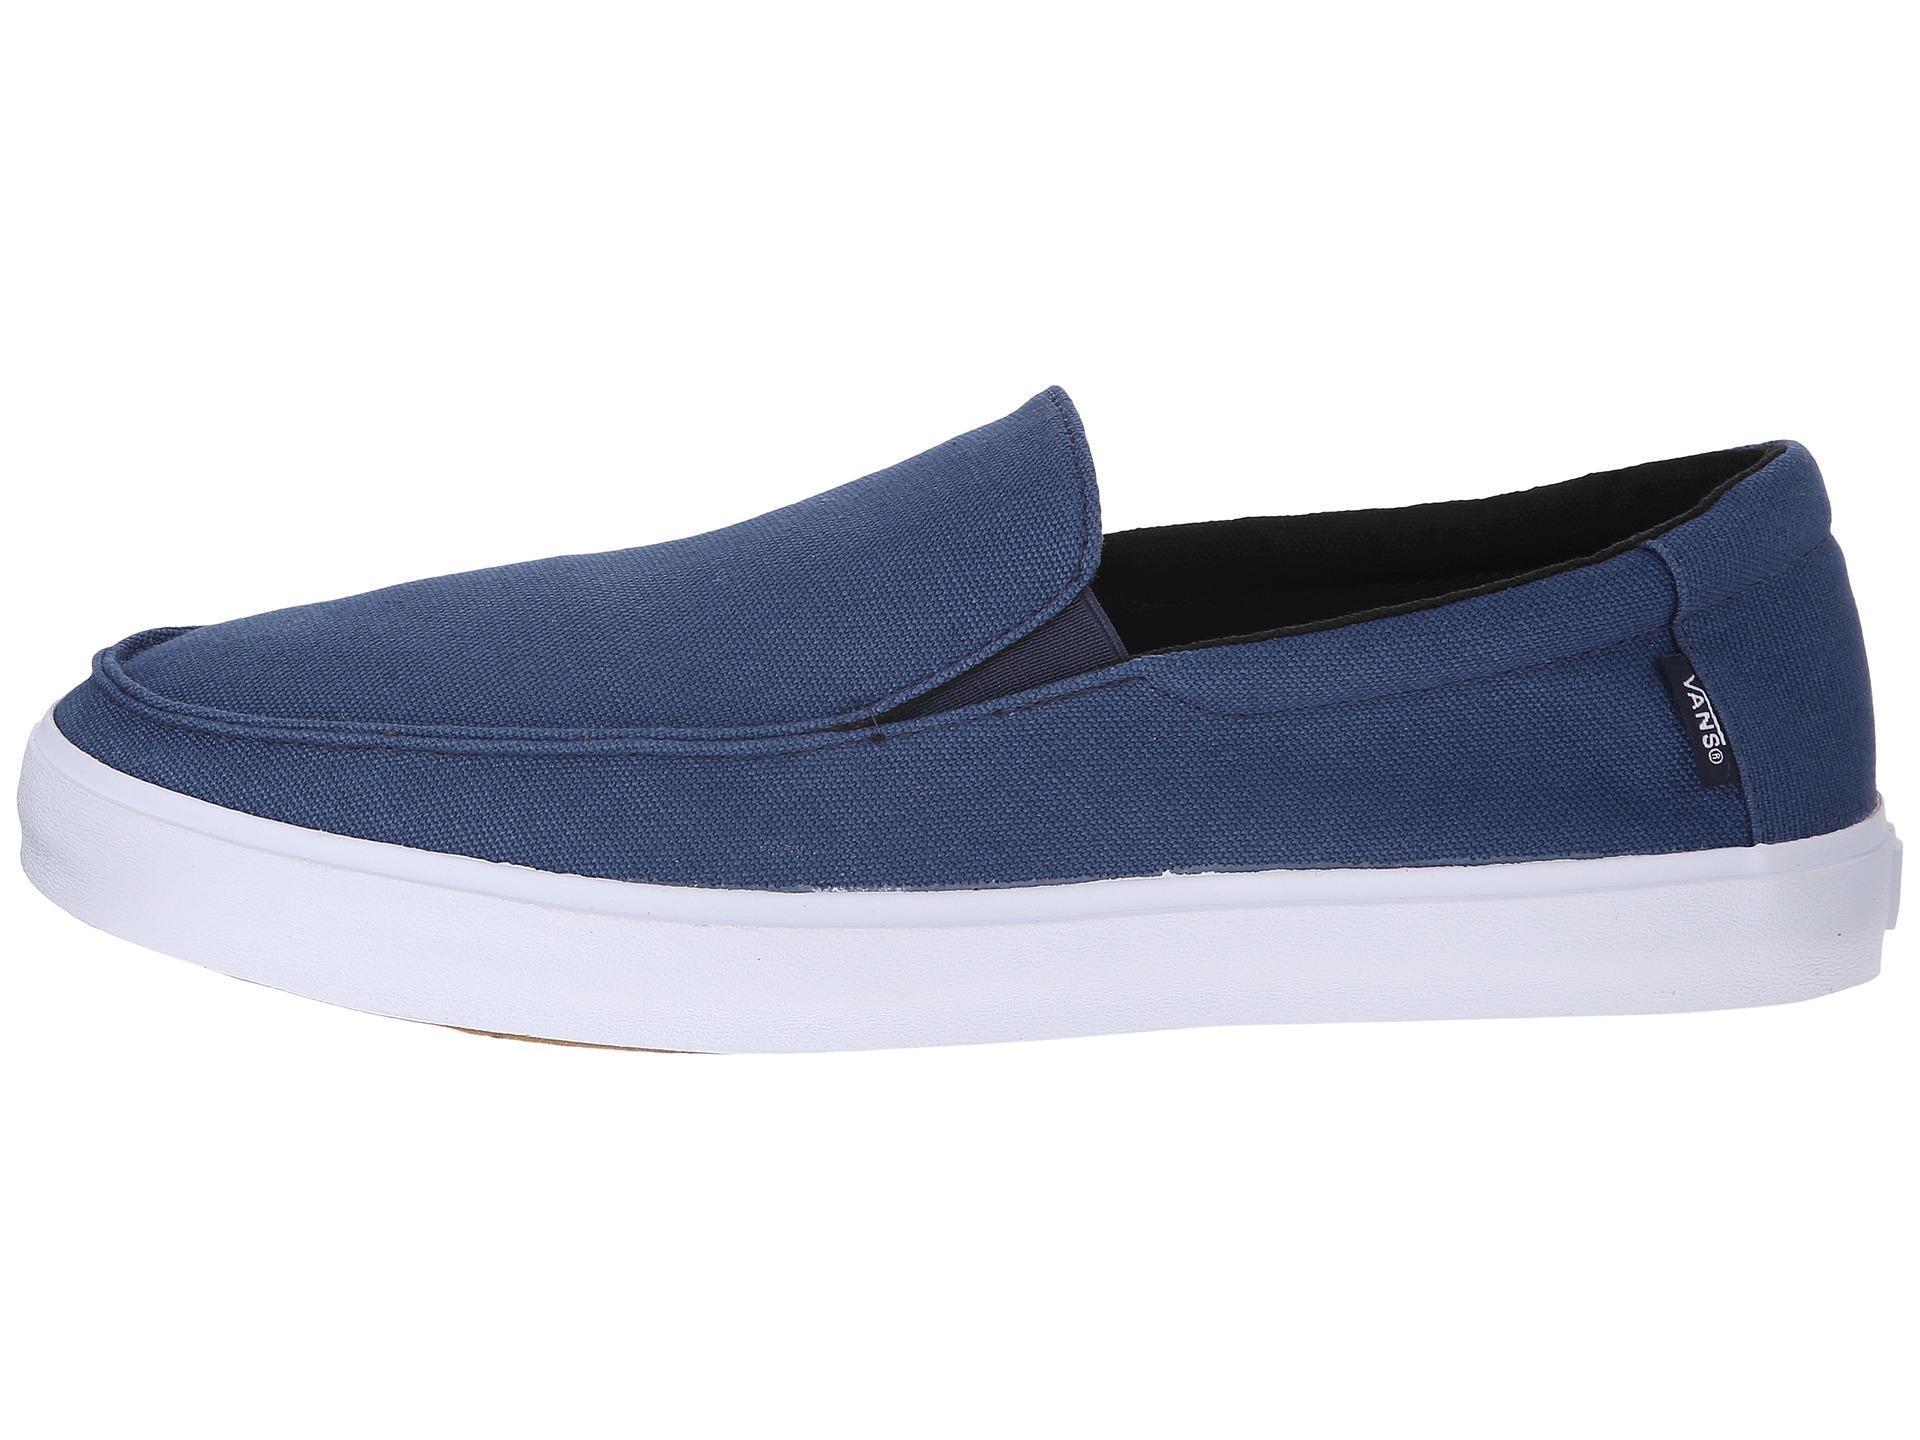 8c10189f89e2 Lyst - Vans Bali Sf in Blue for Men